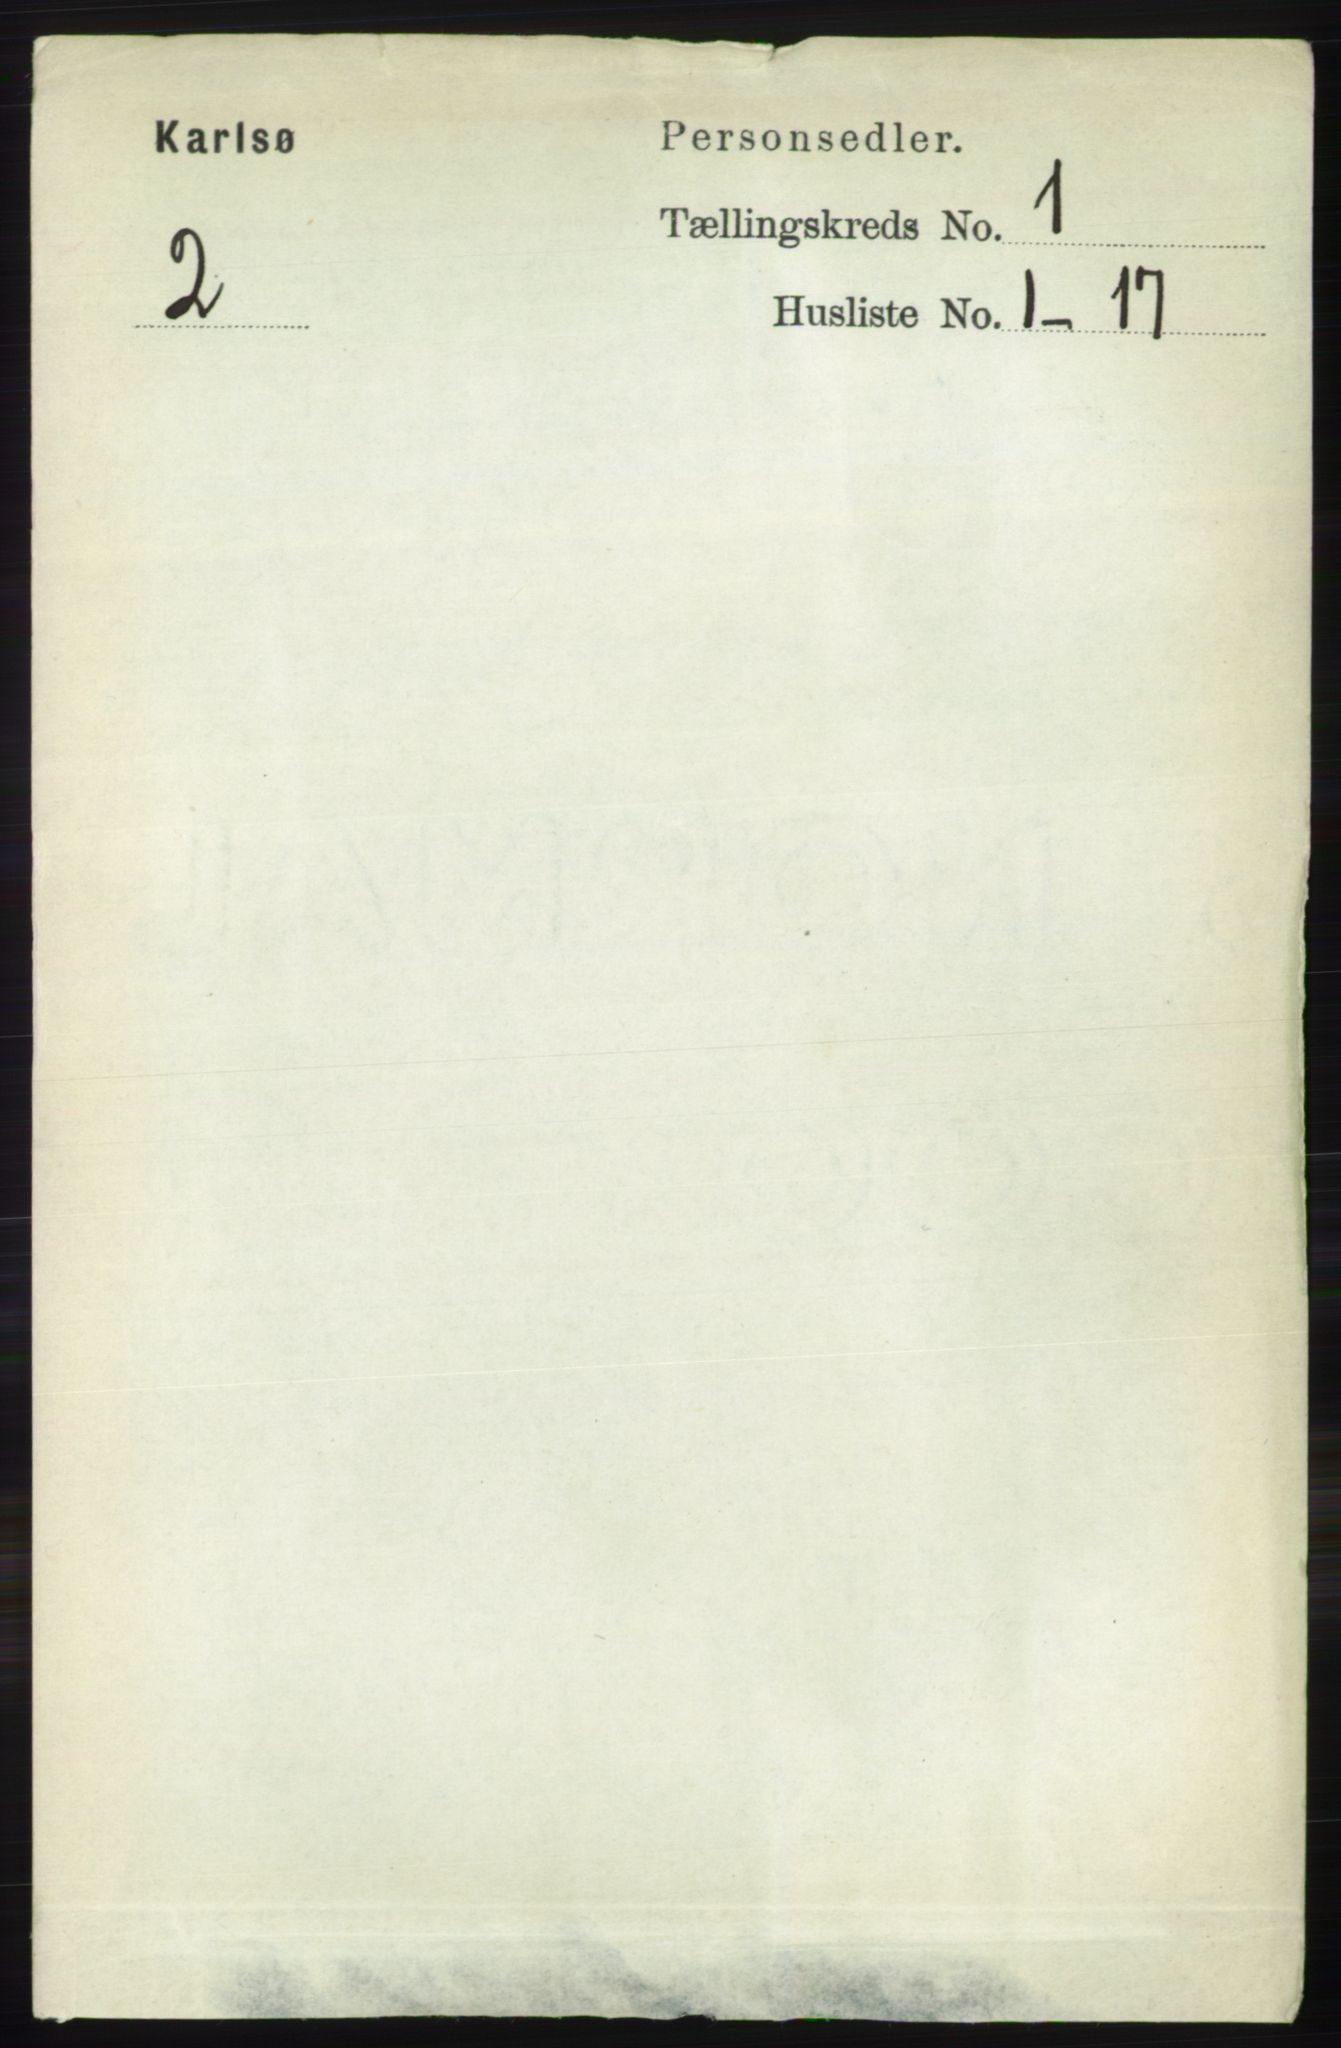 RA, Folketelling 1891 for 1936 Karlsøy herred, 1891, s. 58